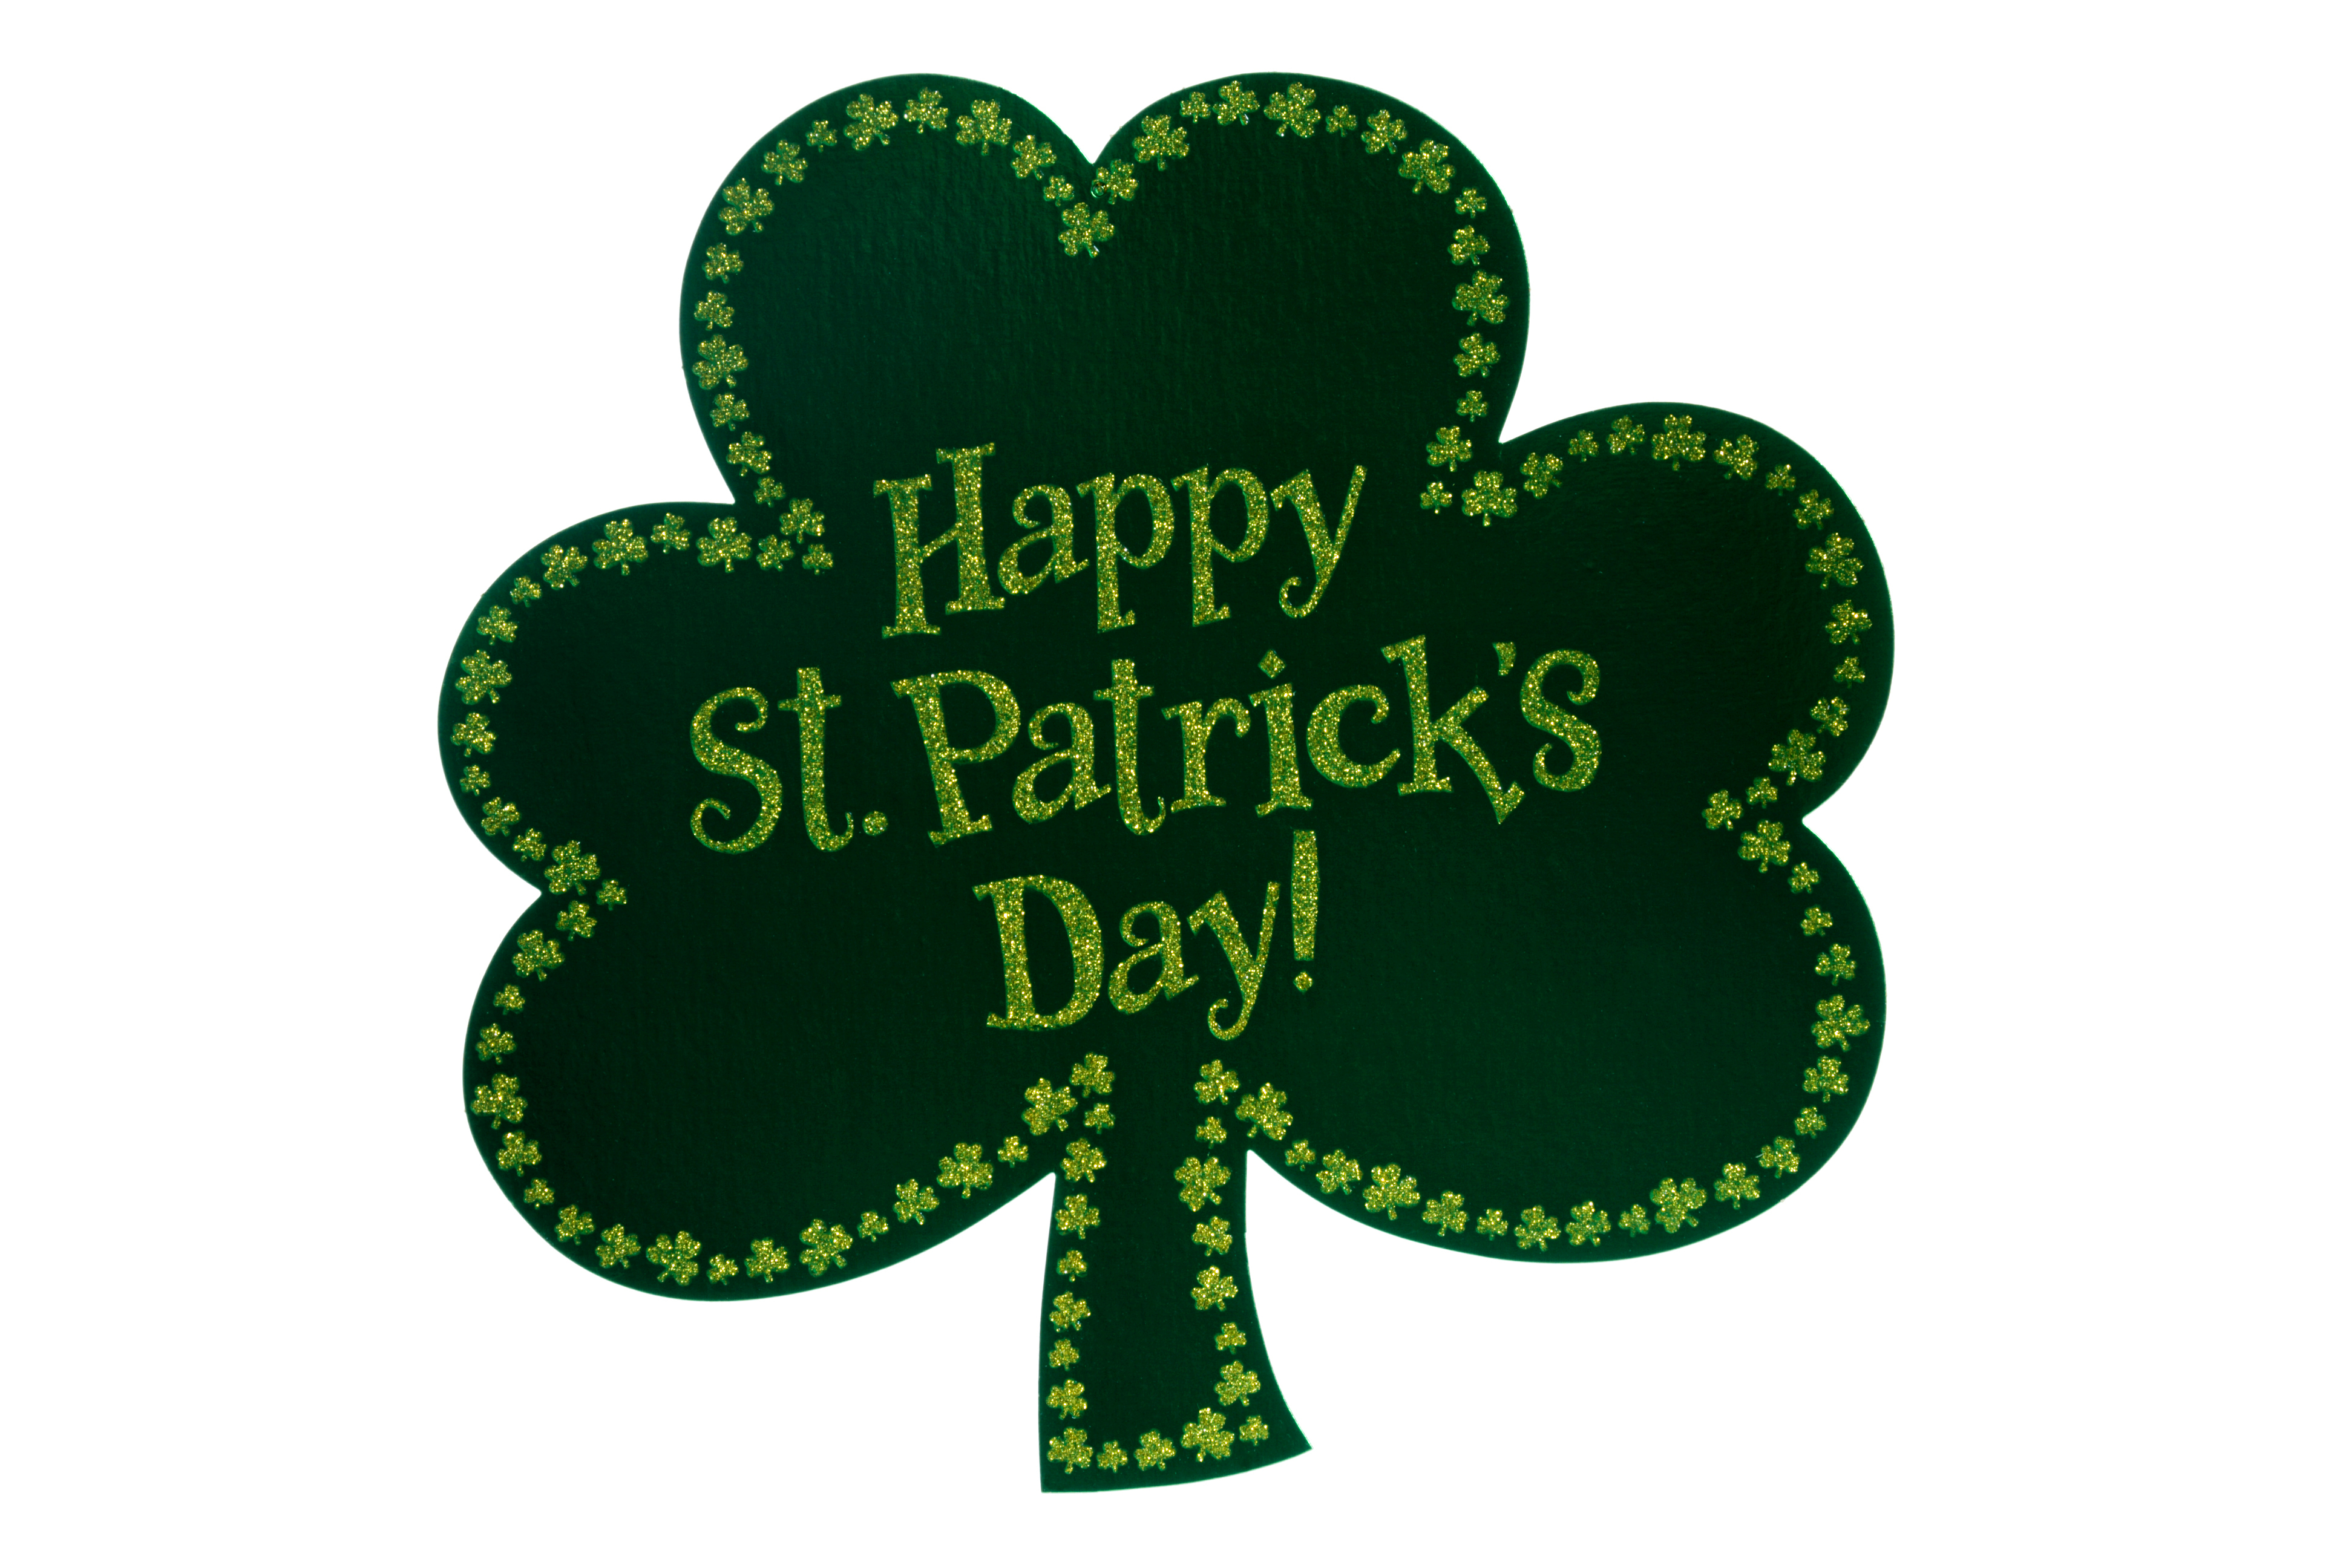 3872x2592 Happy St. Patrick's Day!